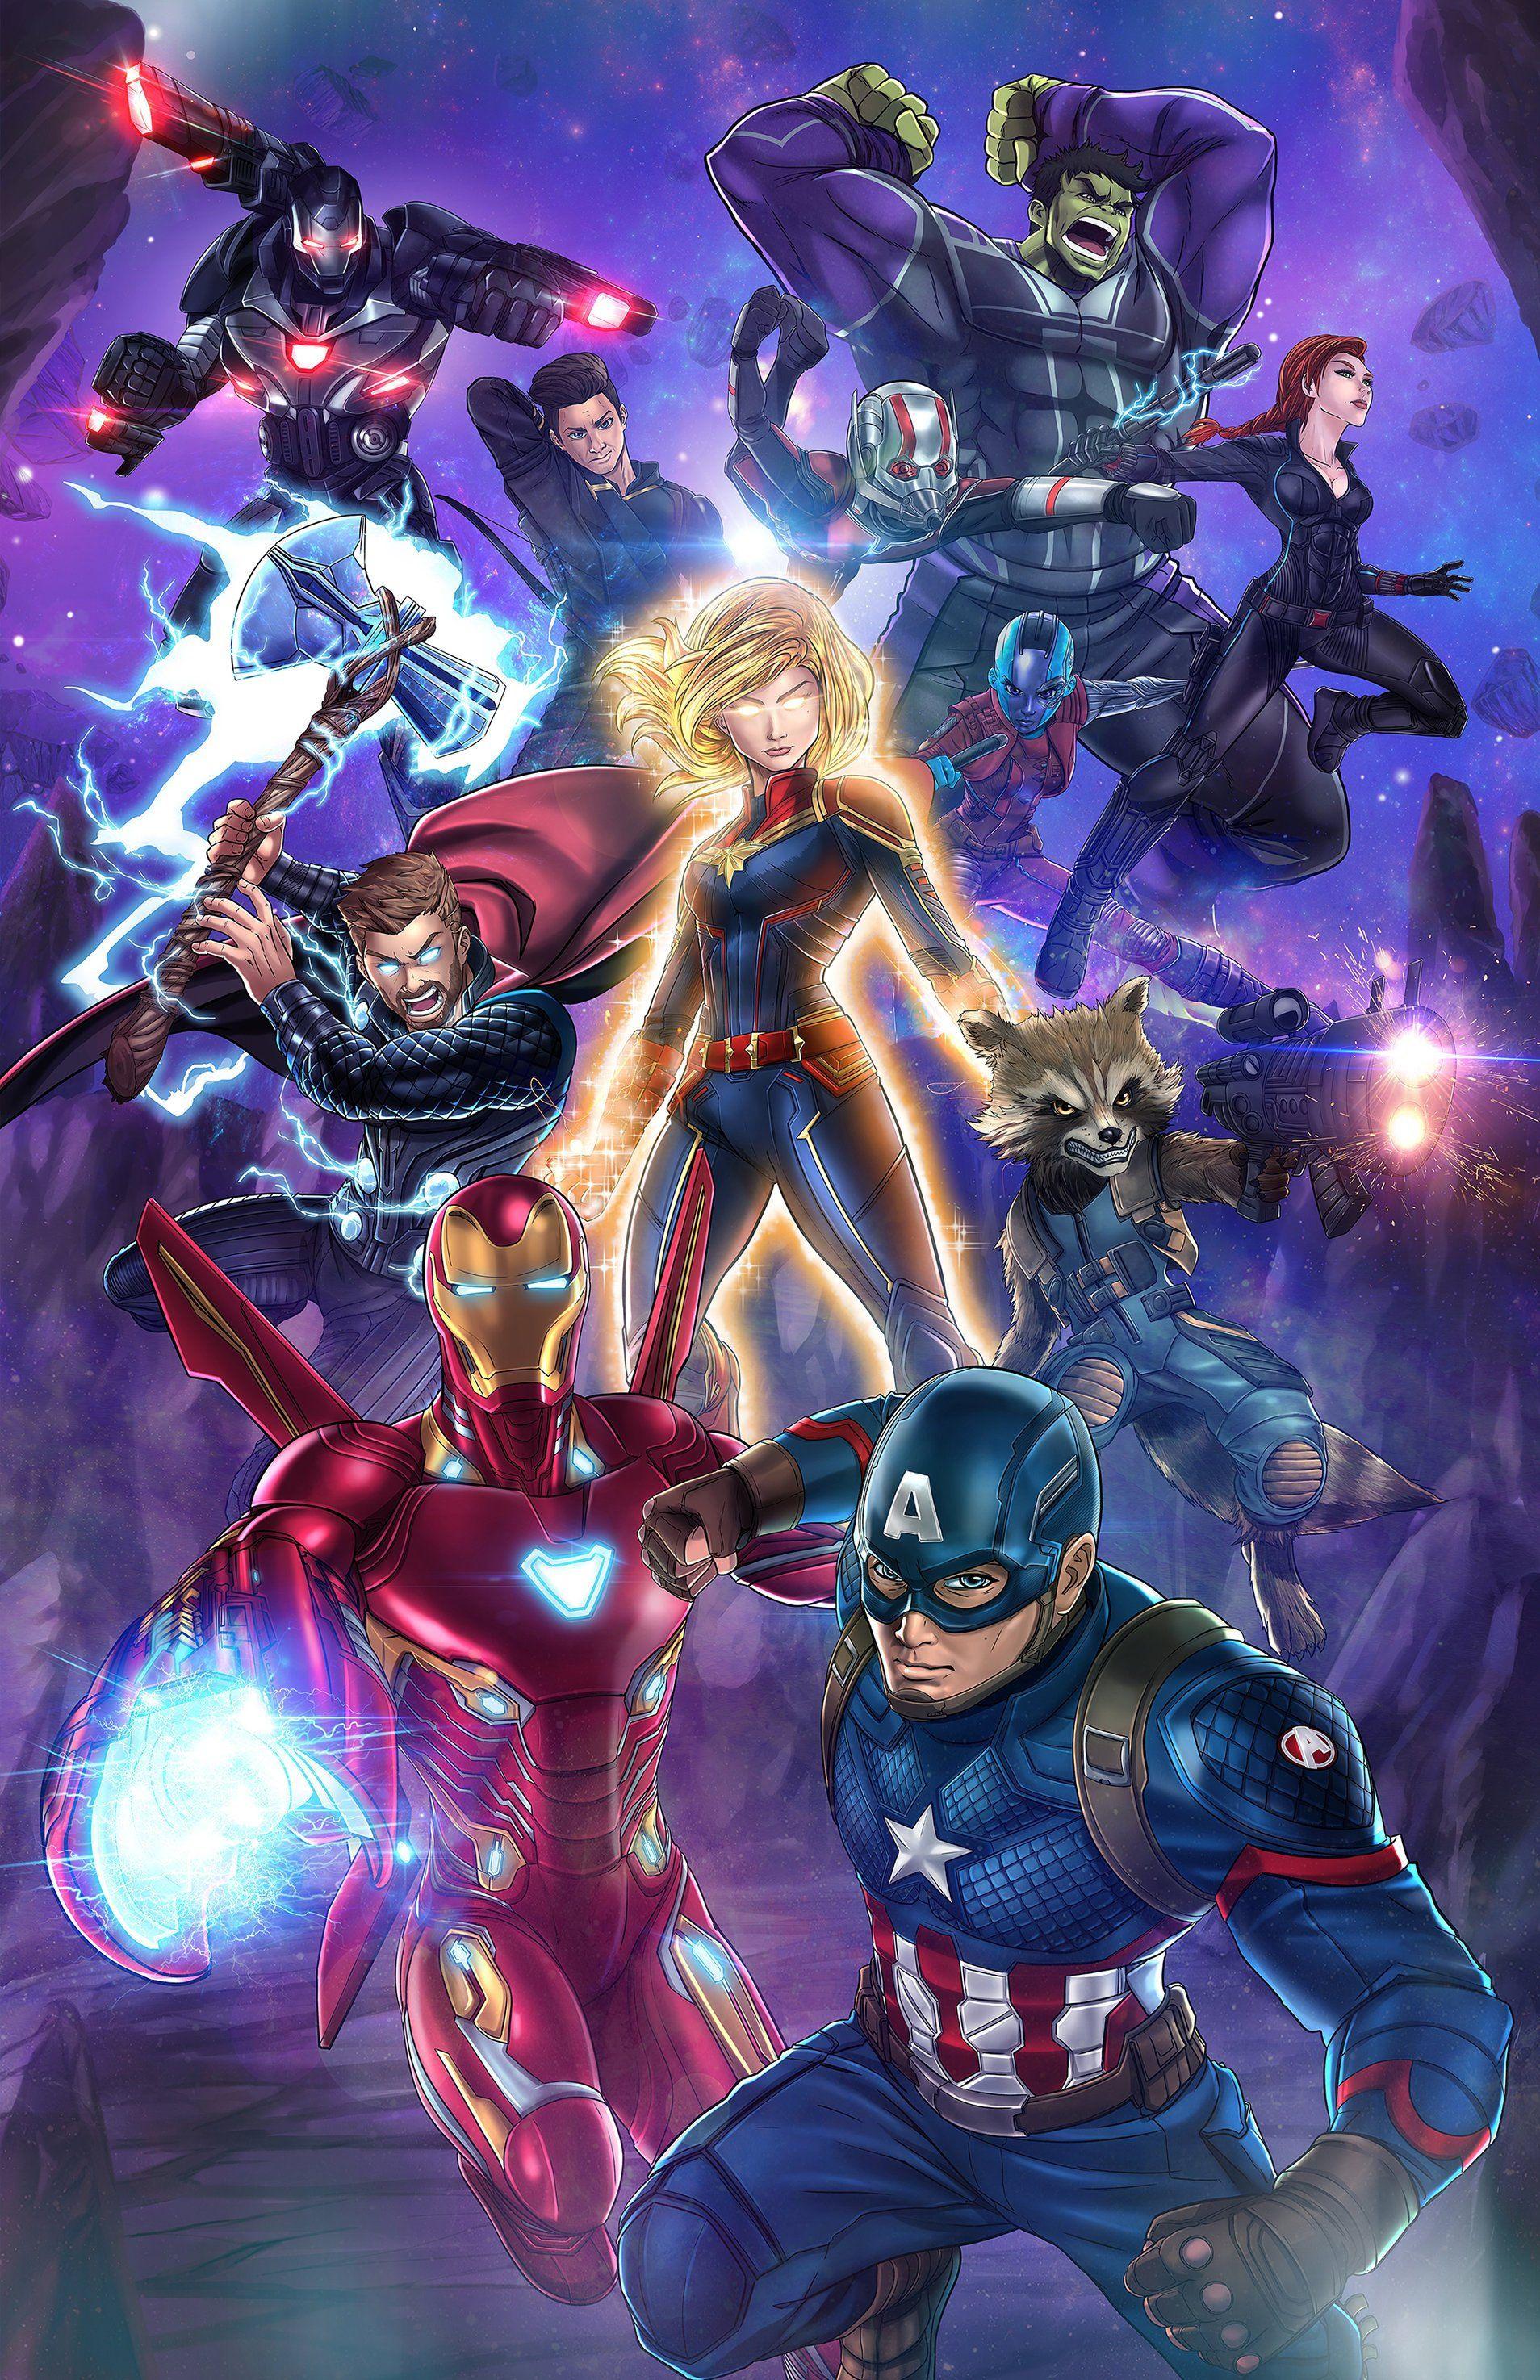 Avengers Endgame Anime With Images Marvel Avengers Comics